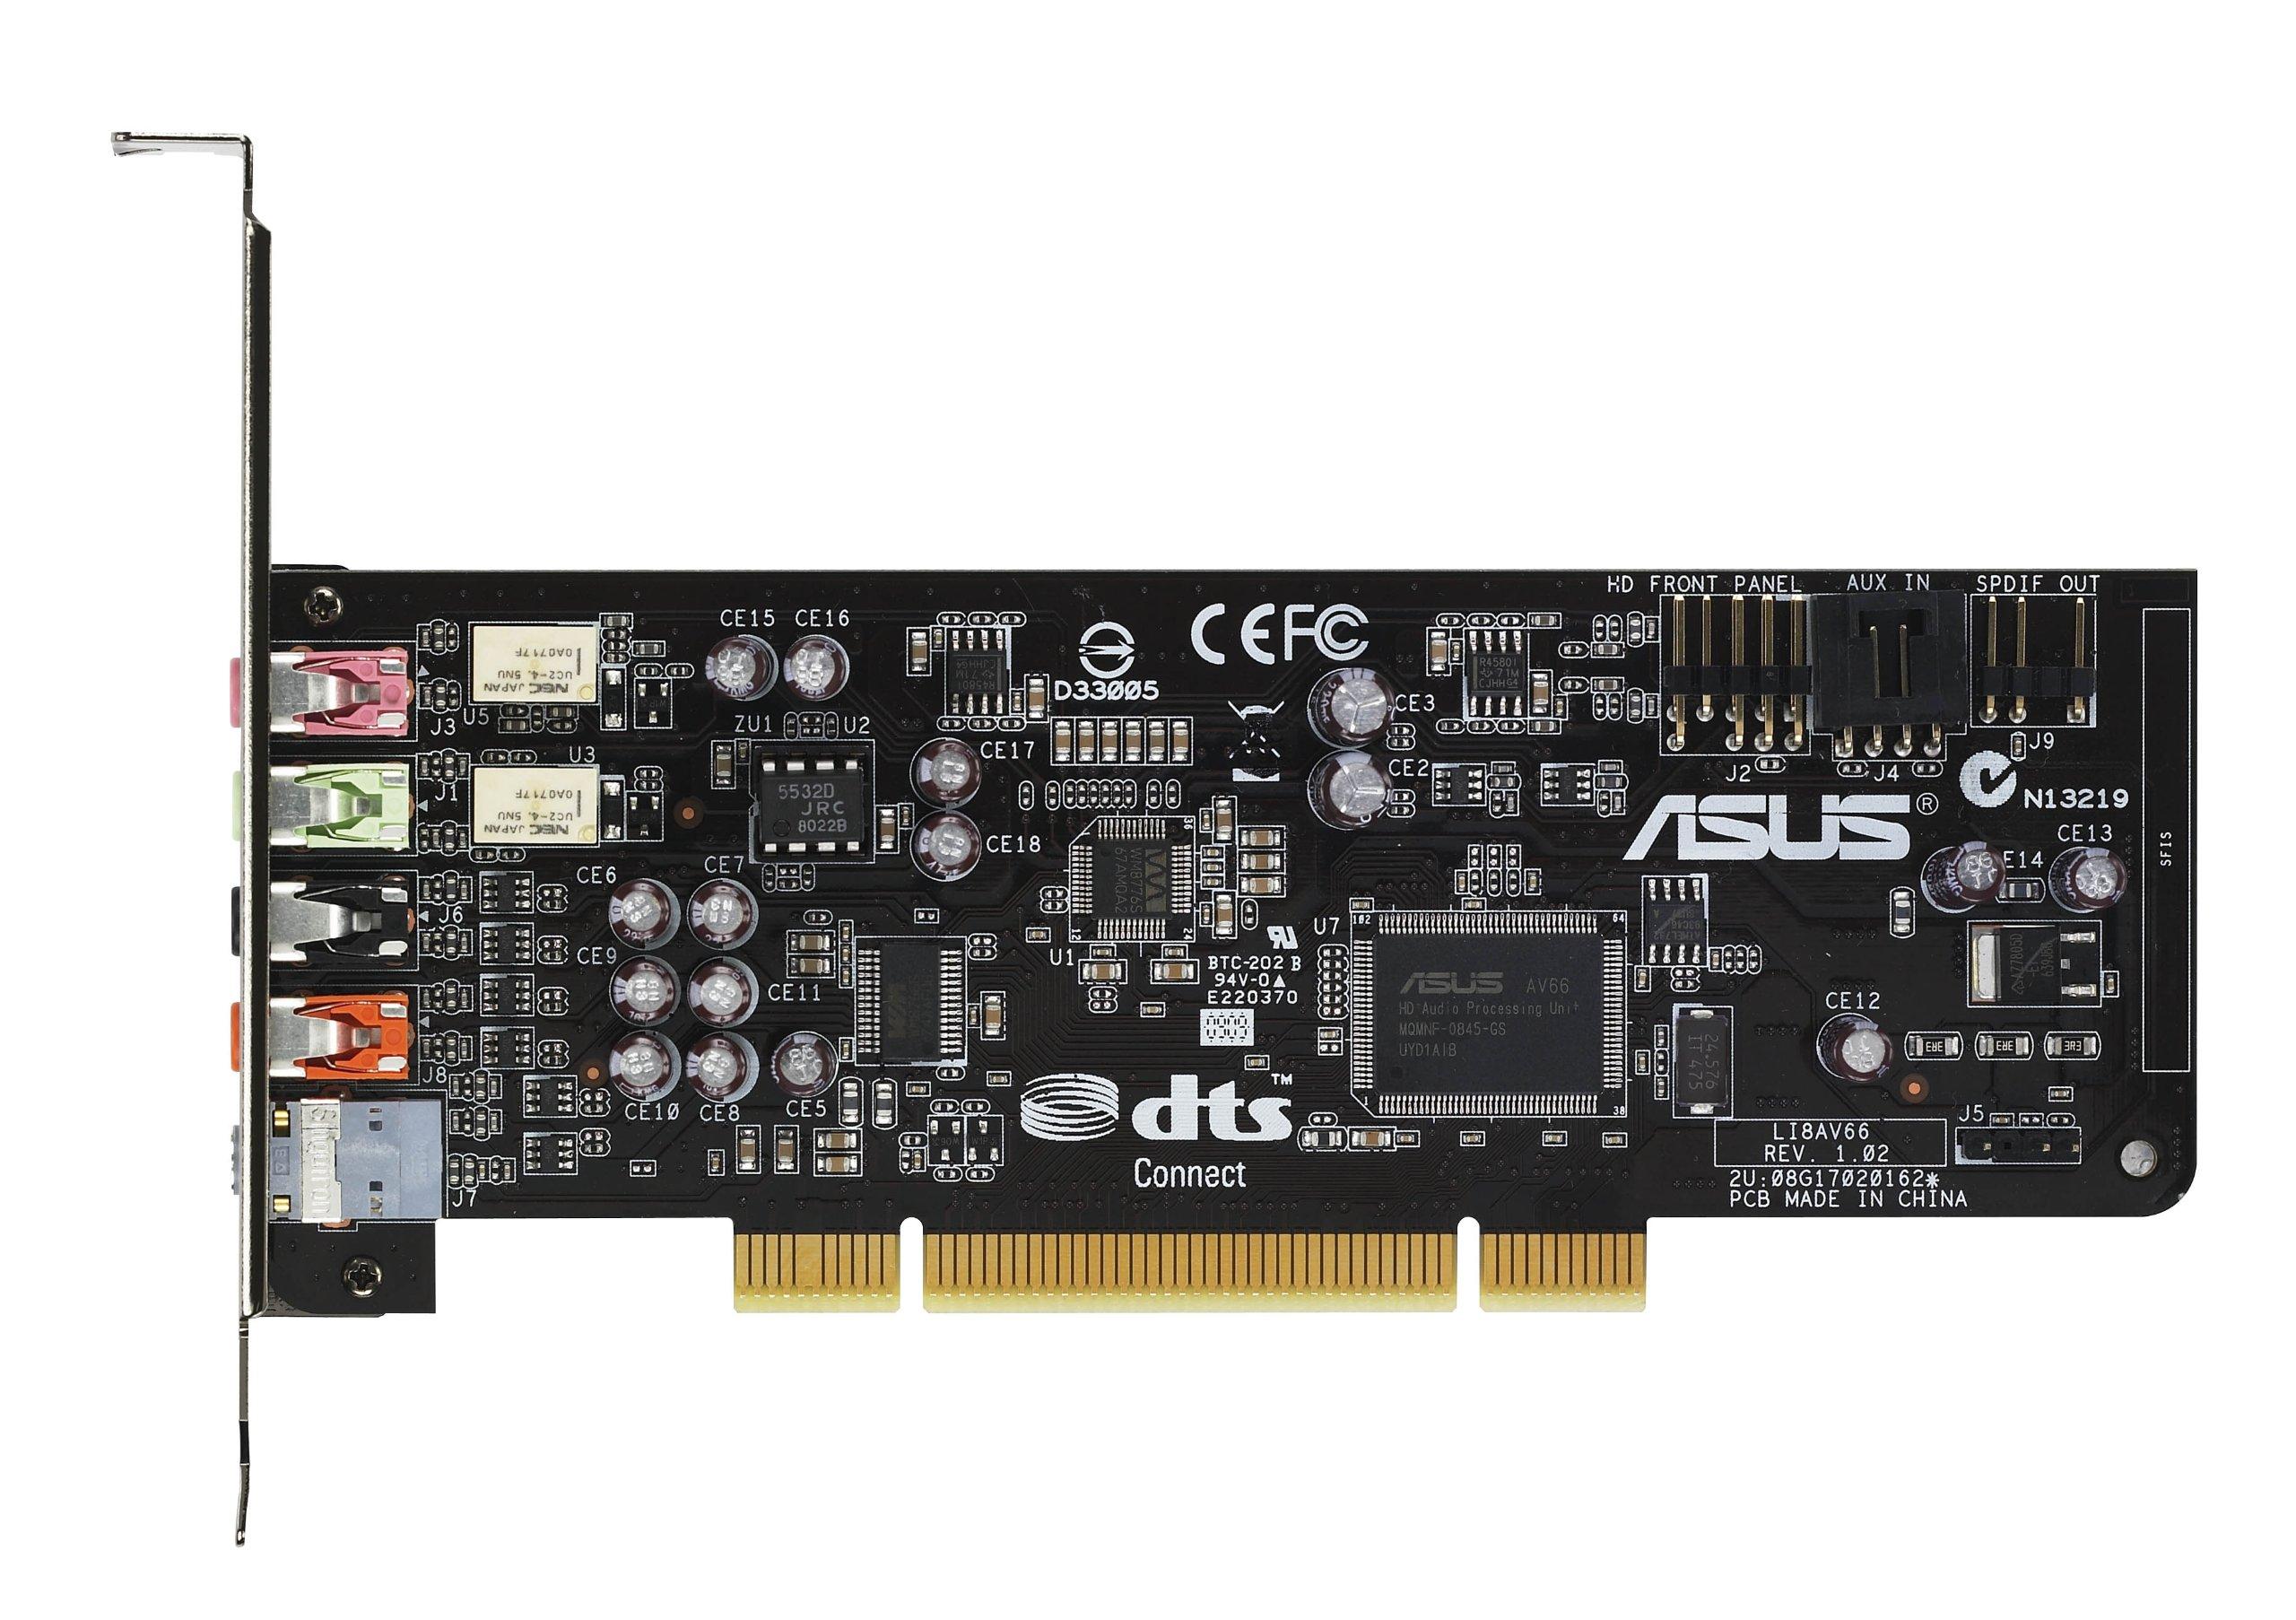 Xonar Dg Amp 5.1 Pci Sound Card Gx 2.5 Gaming Dolby Headphone by ASUS